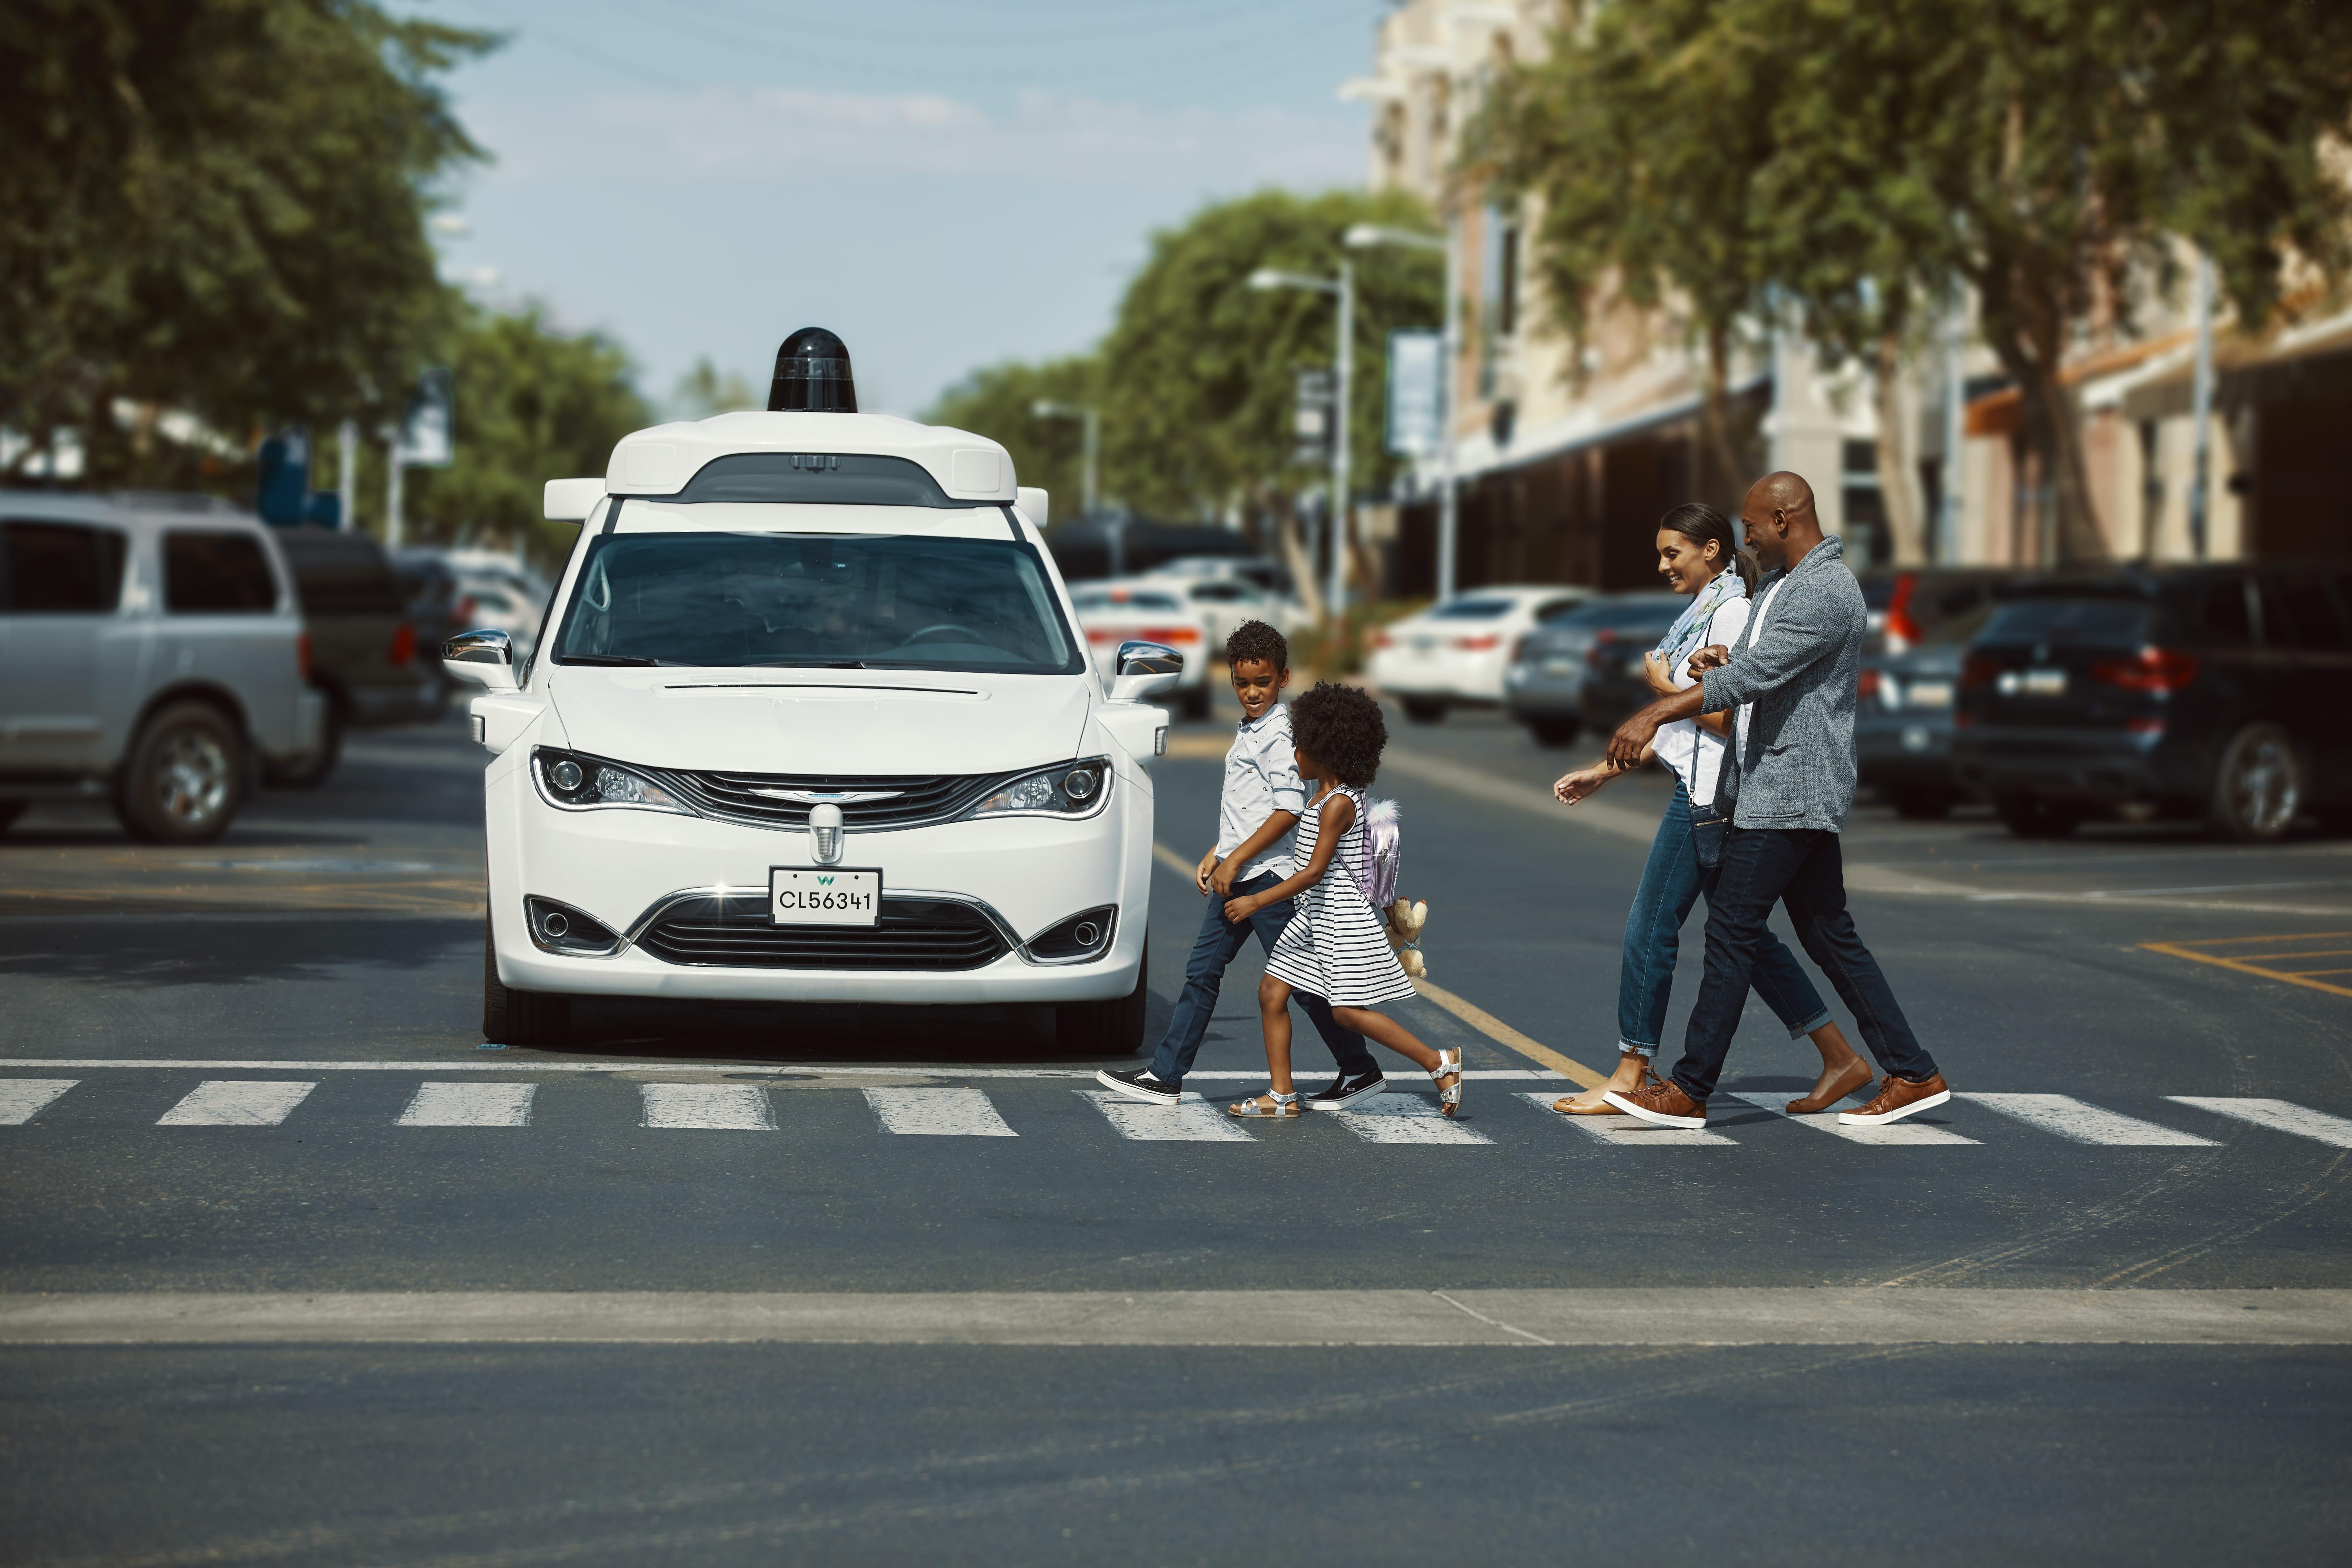 Waymo's autonomously driven Chrysler Pacifica Hybrid minivan at a crosswalk